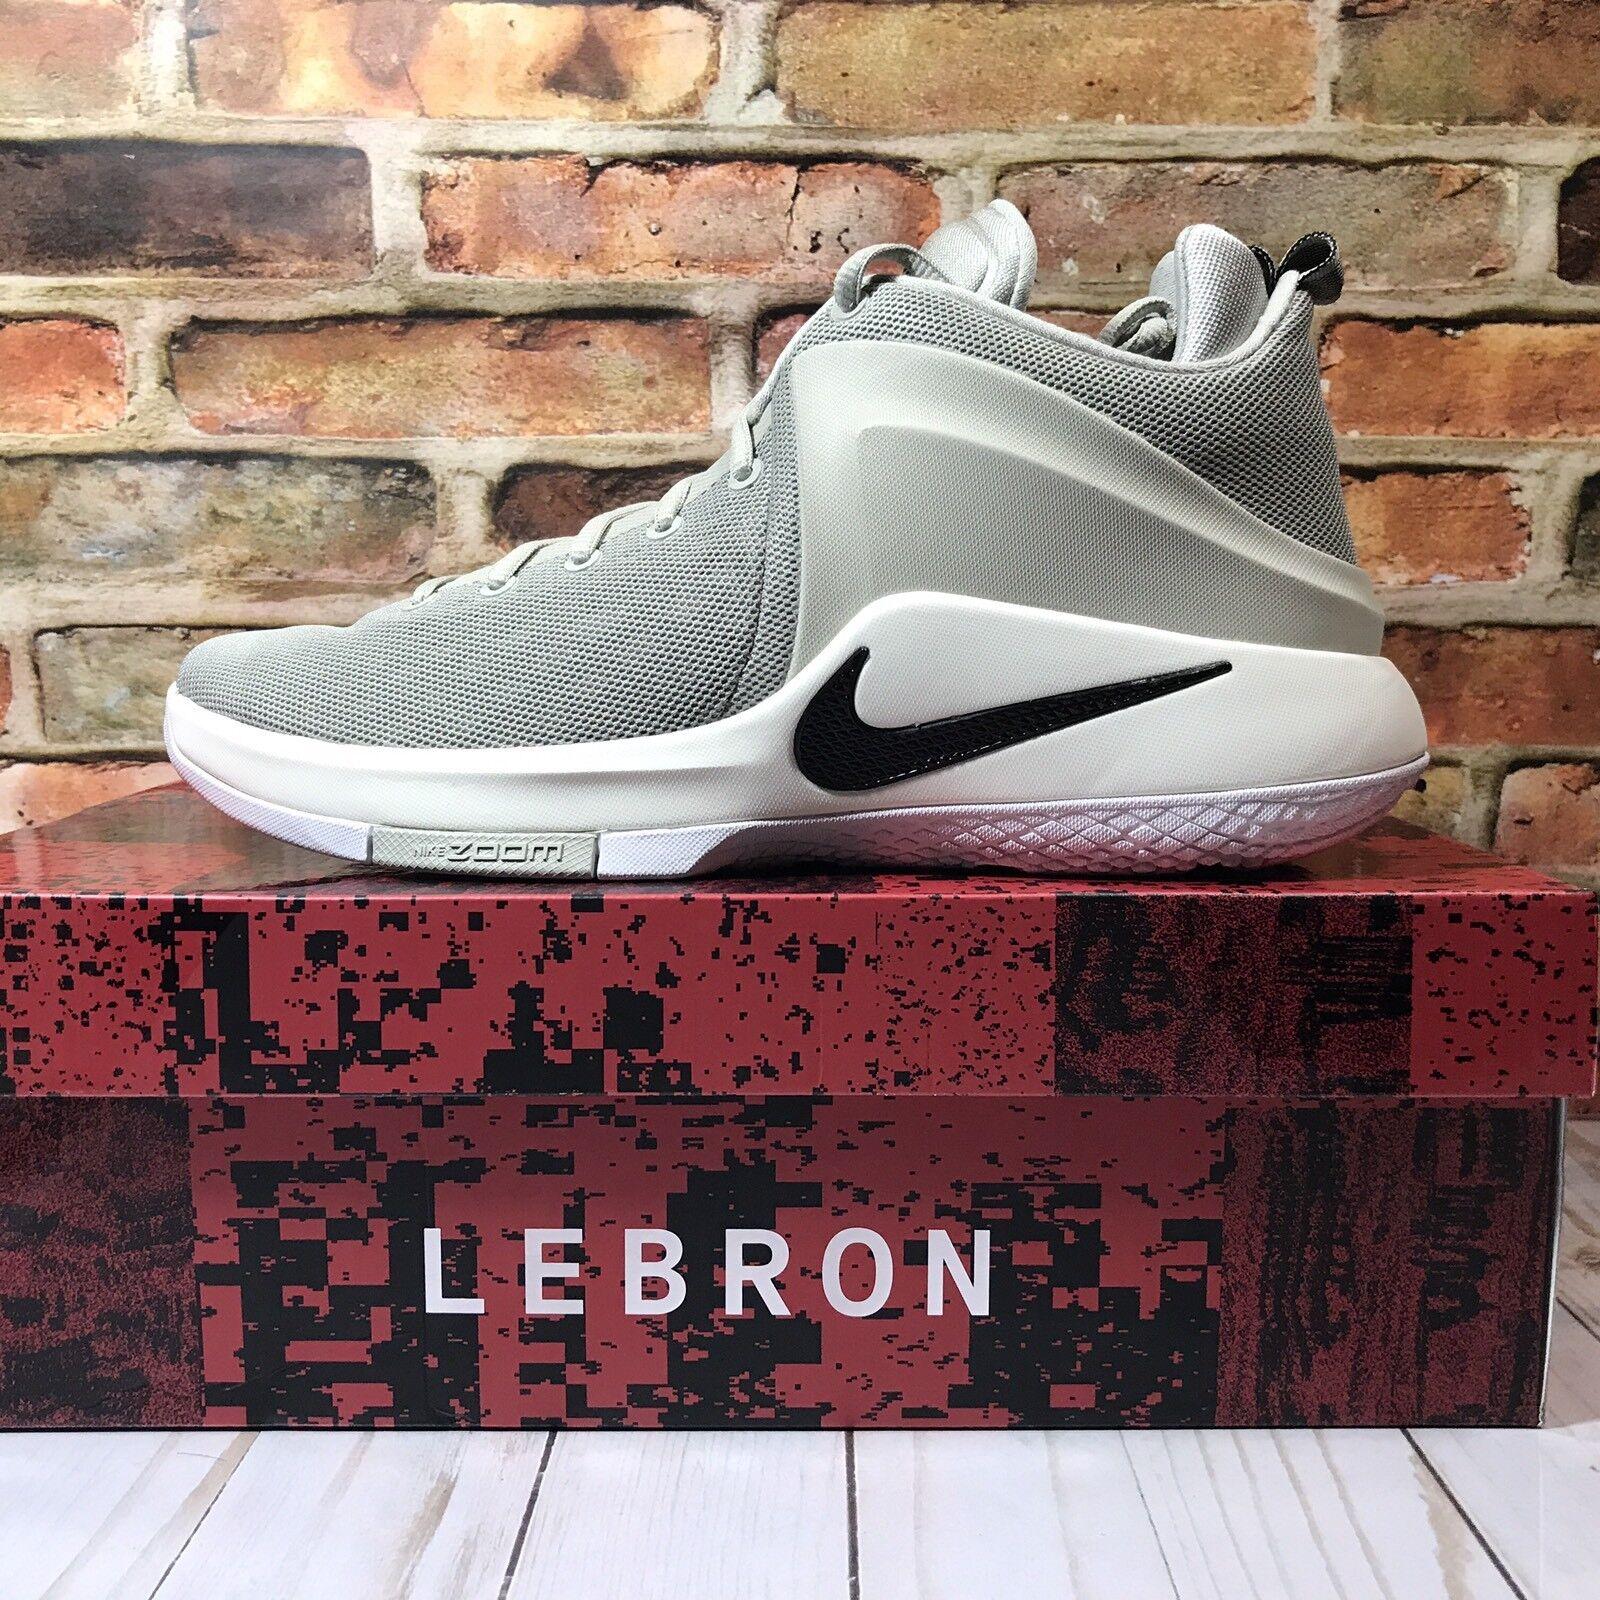 Nike lebron mens zoom zeugen zeugen zoom neue sz - 11 grau - schwarze basketball - schuhe 852439 011 fd32ea